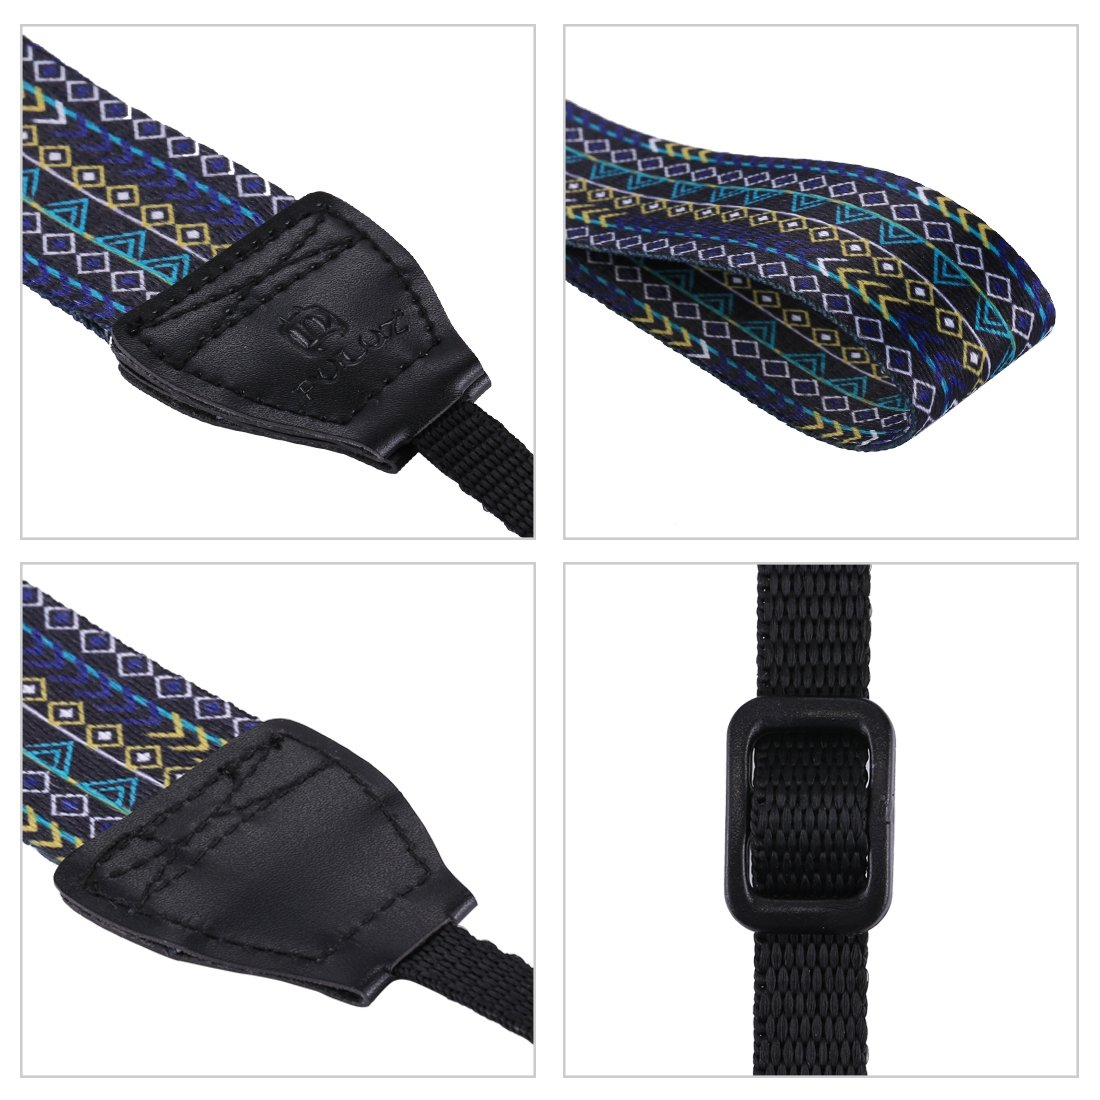 Color : Color1 Retro Ethnic Style Multi-Color Series Shoulder Neck Strap Camera Strap for SLR//DSLR Cameras Durable